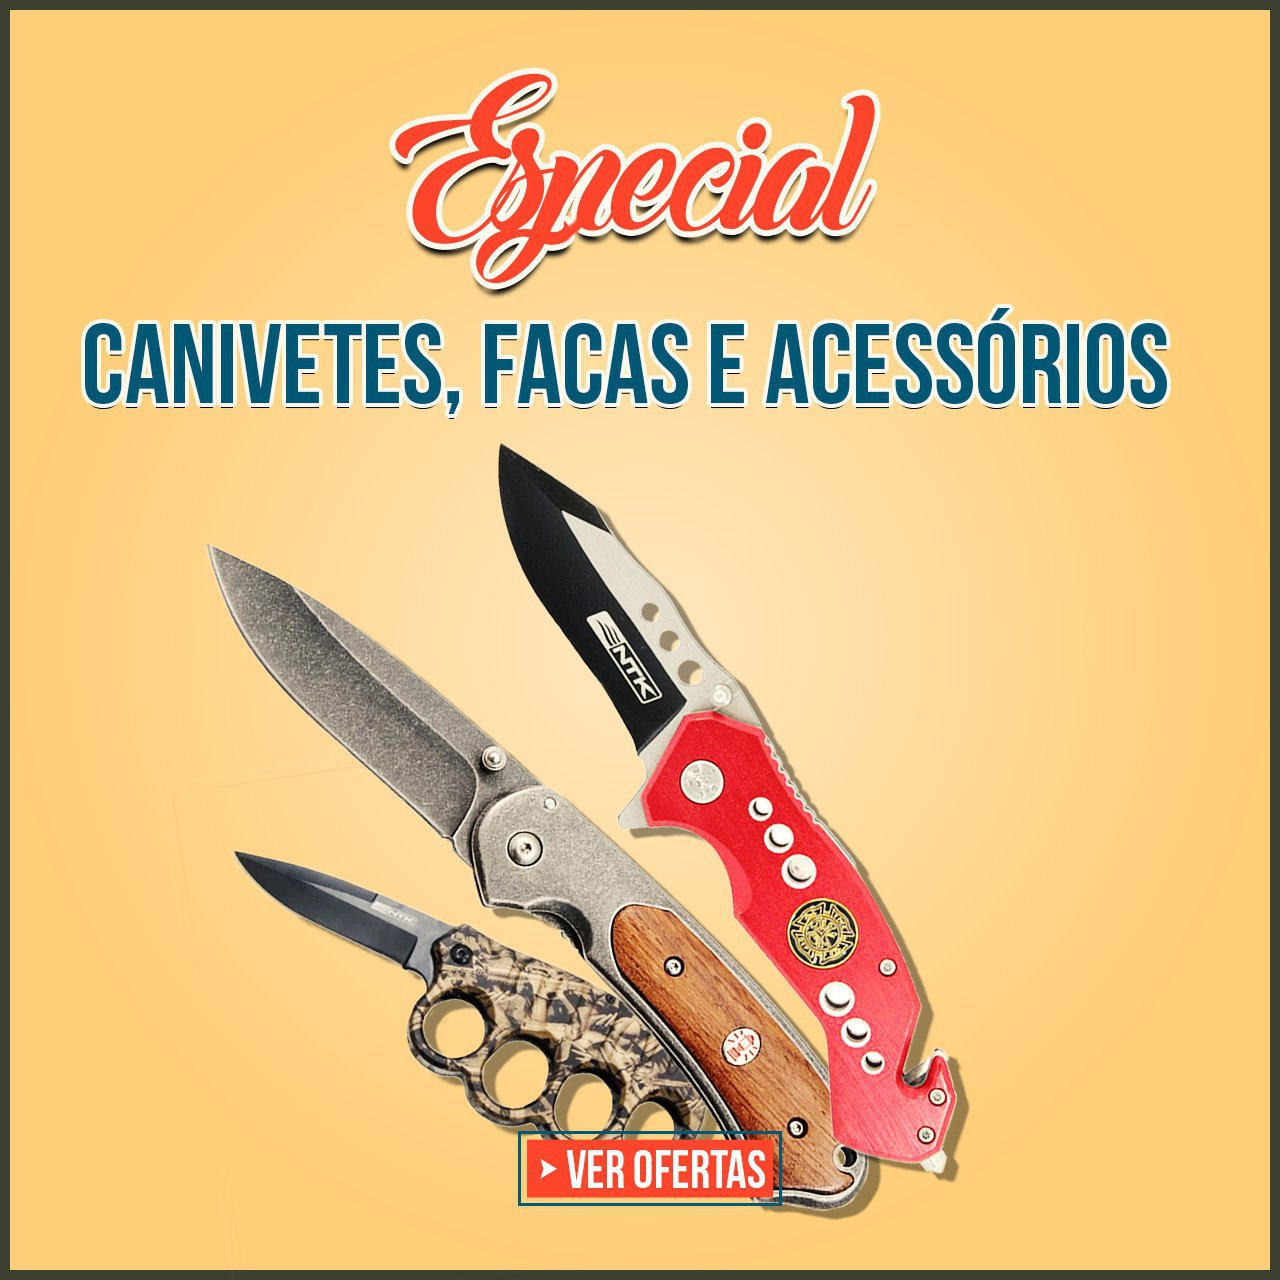 ESPECIAL CANIVES, FACAS E ACESSORIOS